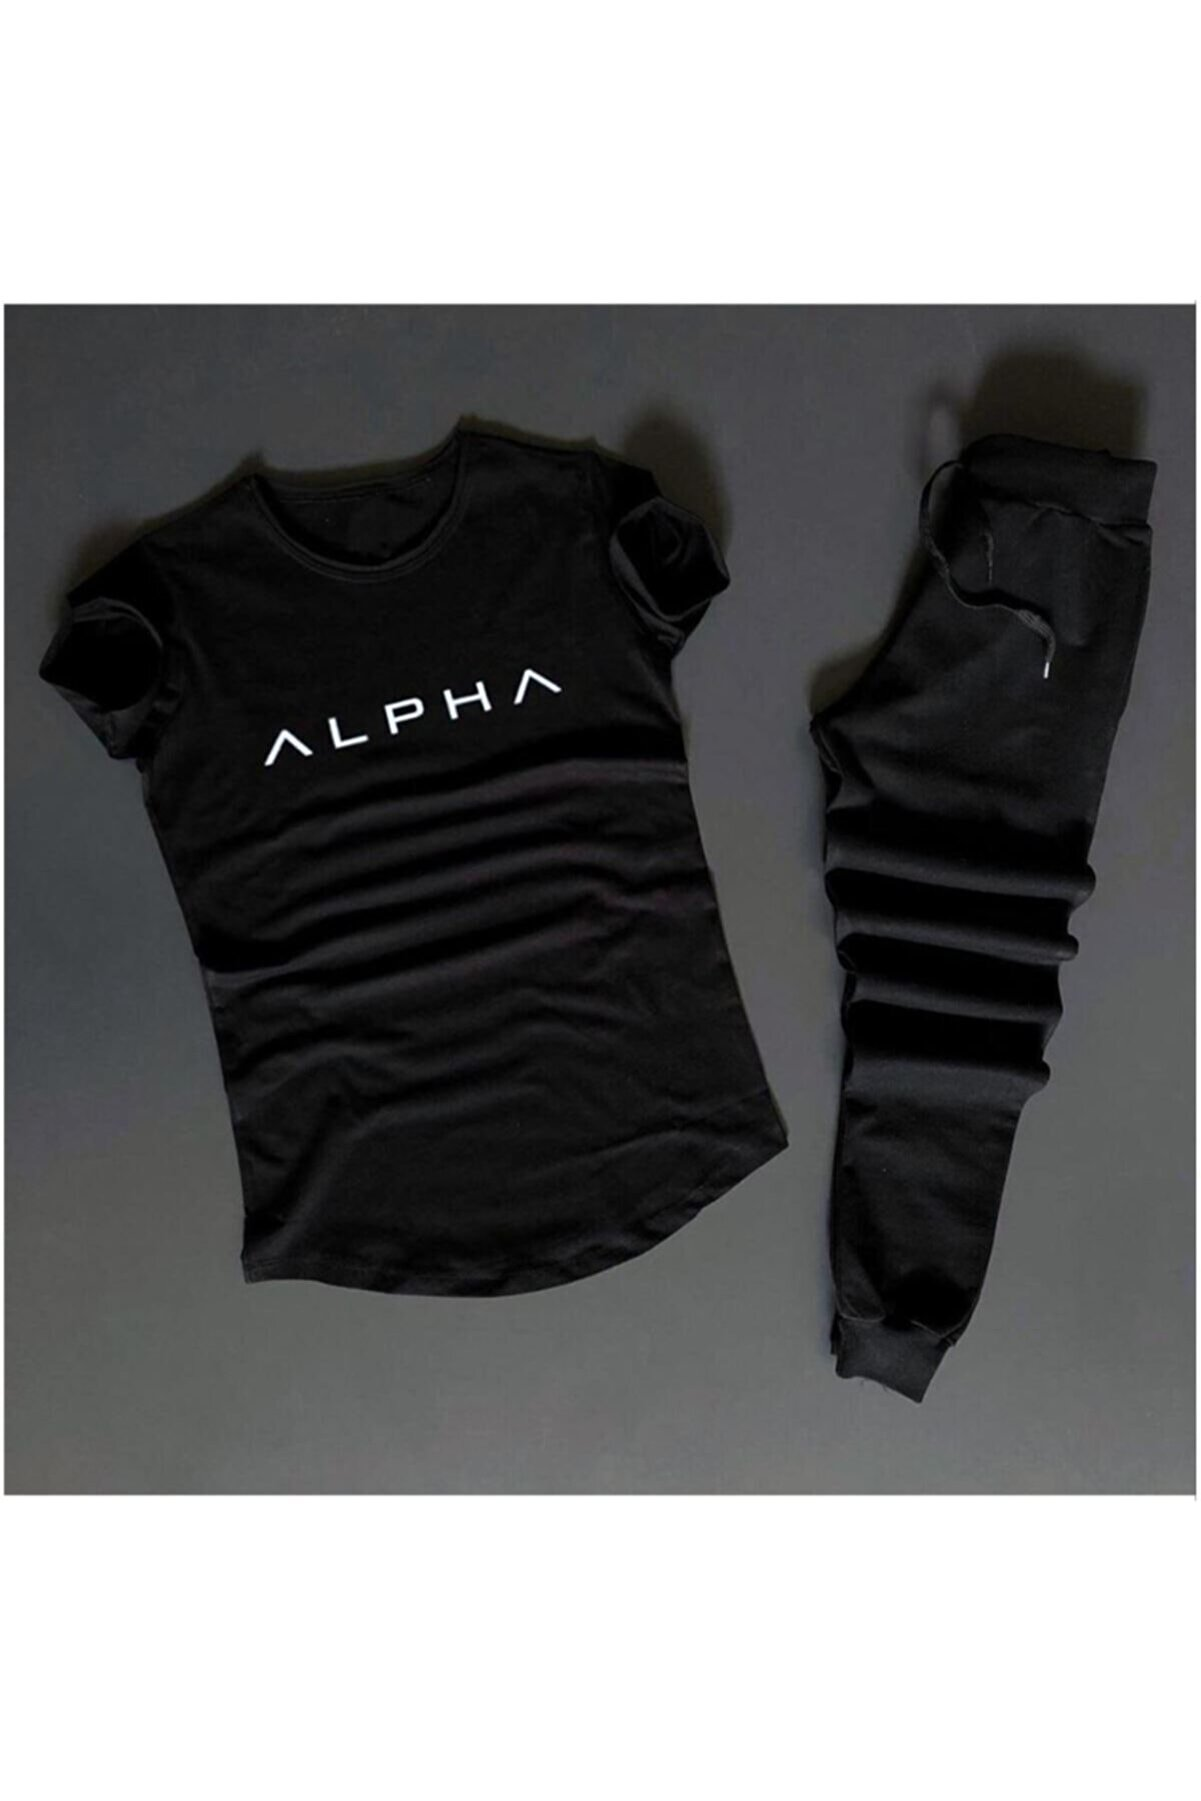 uyguntarz Alpha Siyah Eş Niksiyah Eşofman /d-4